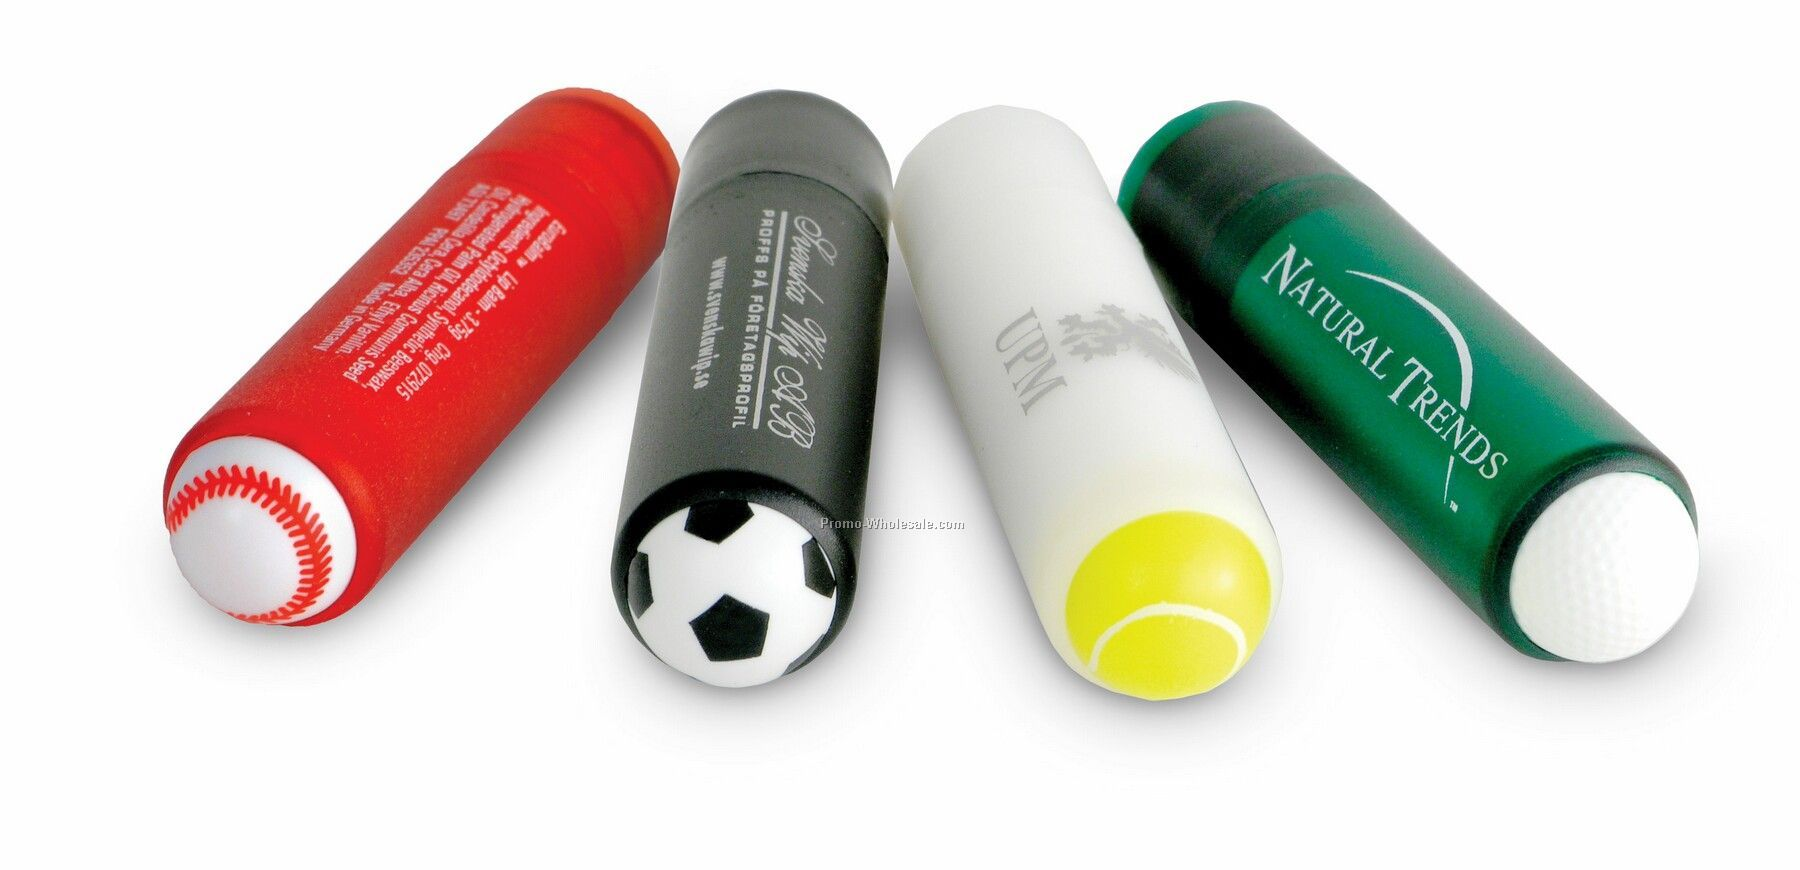 Eurobalm Lip Balm W/ Sporttop